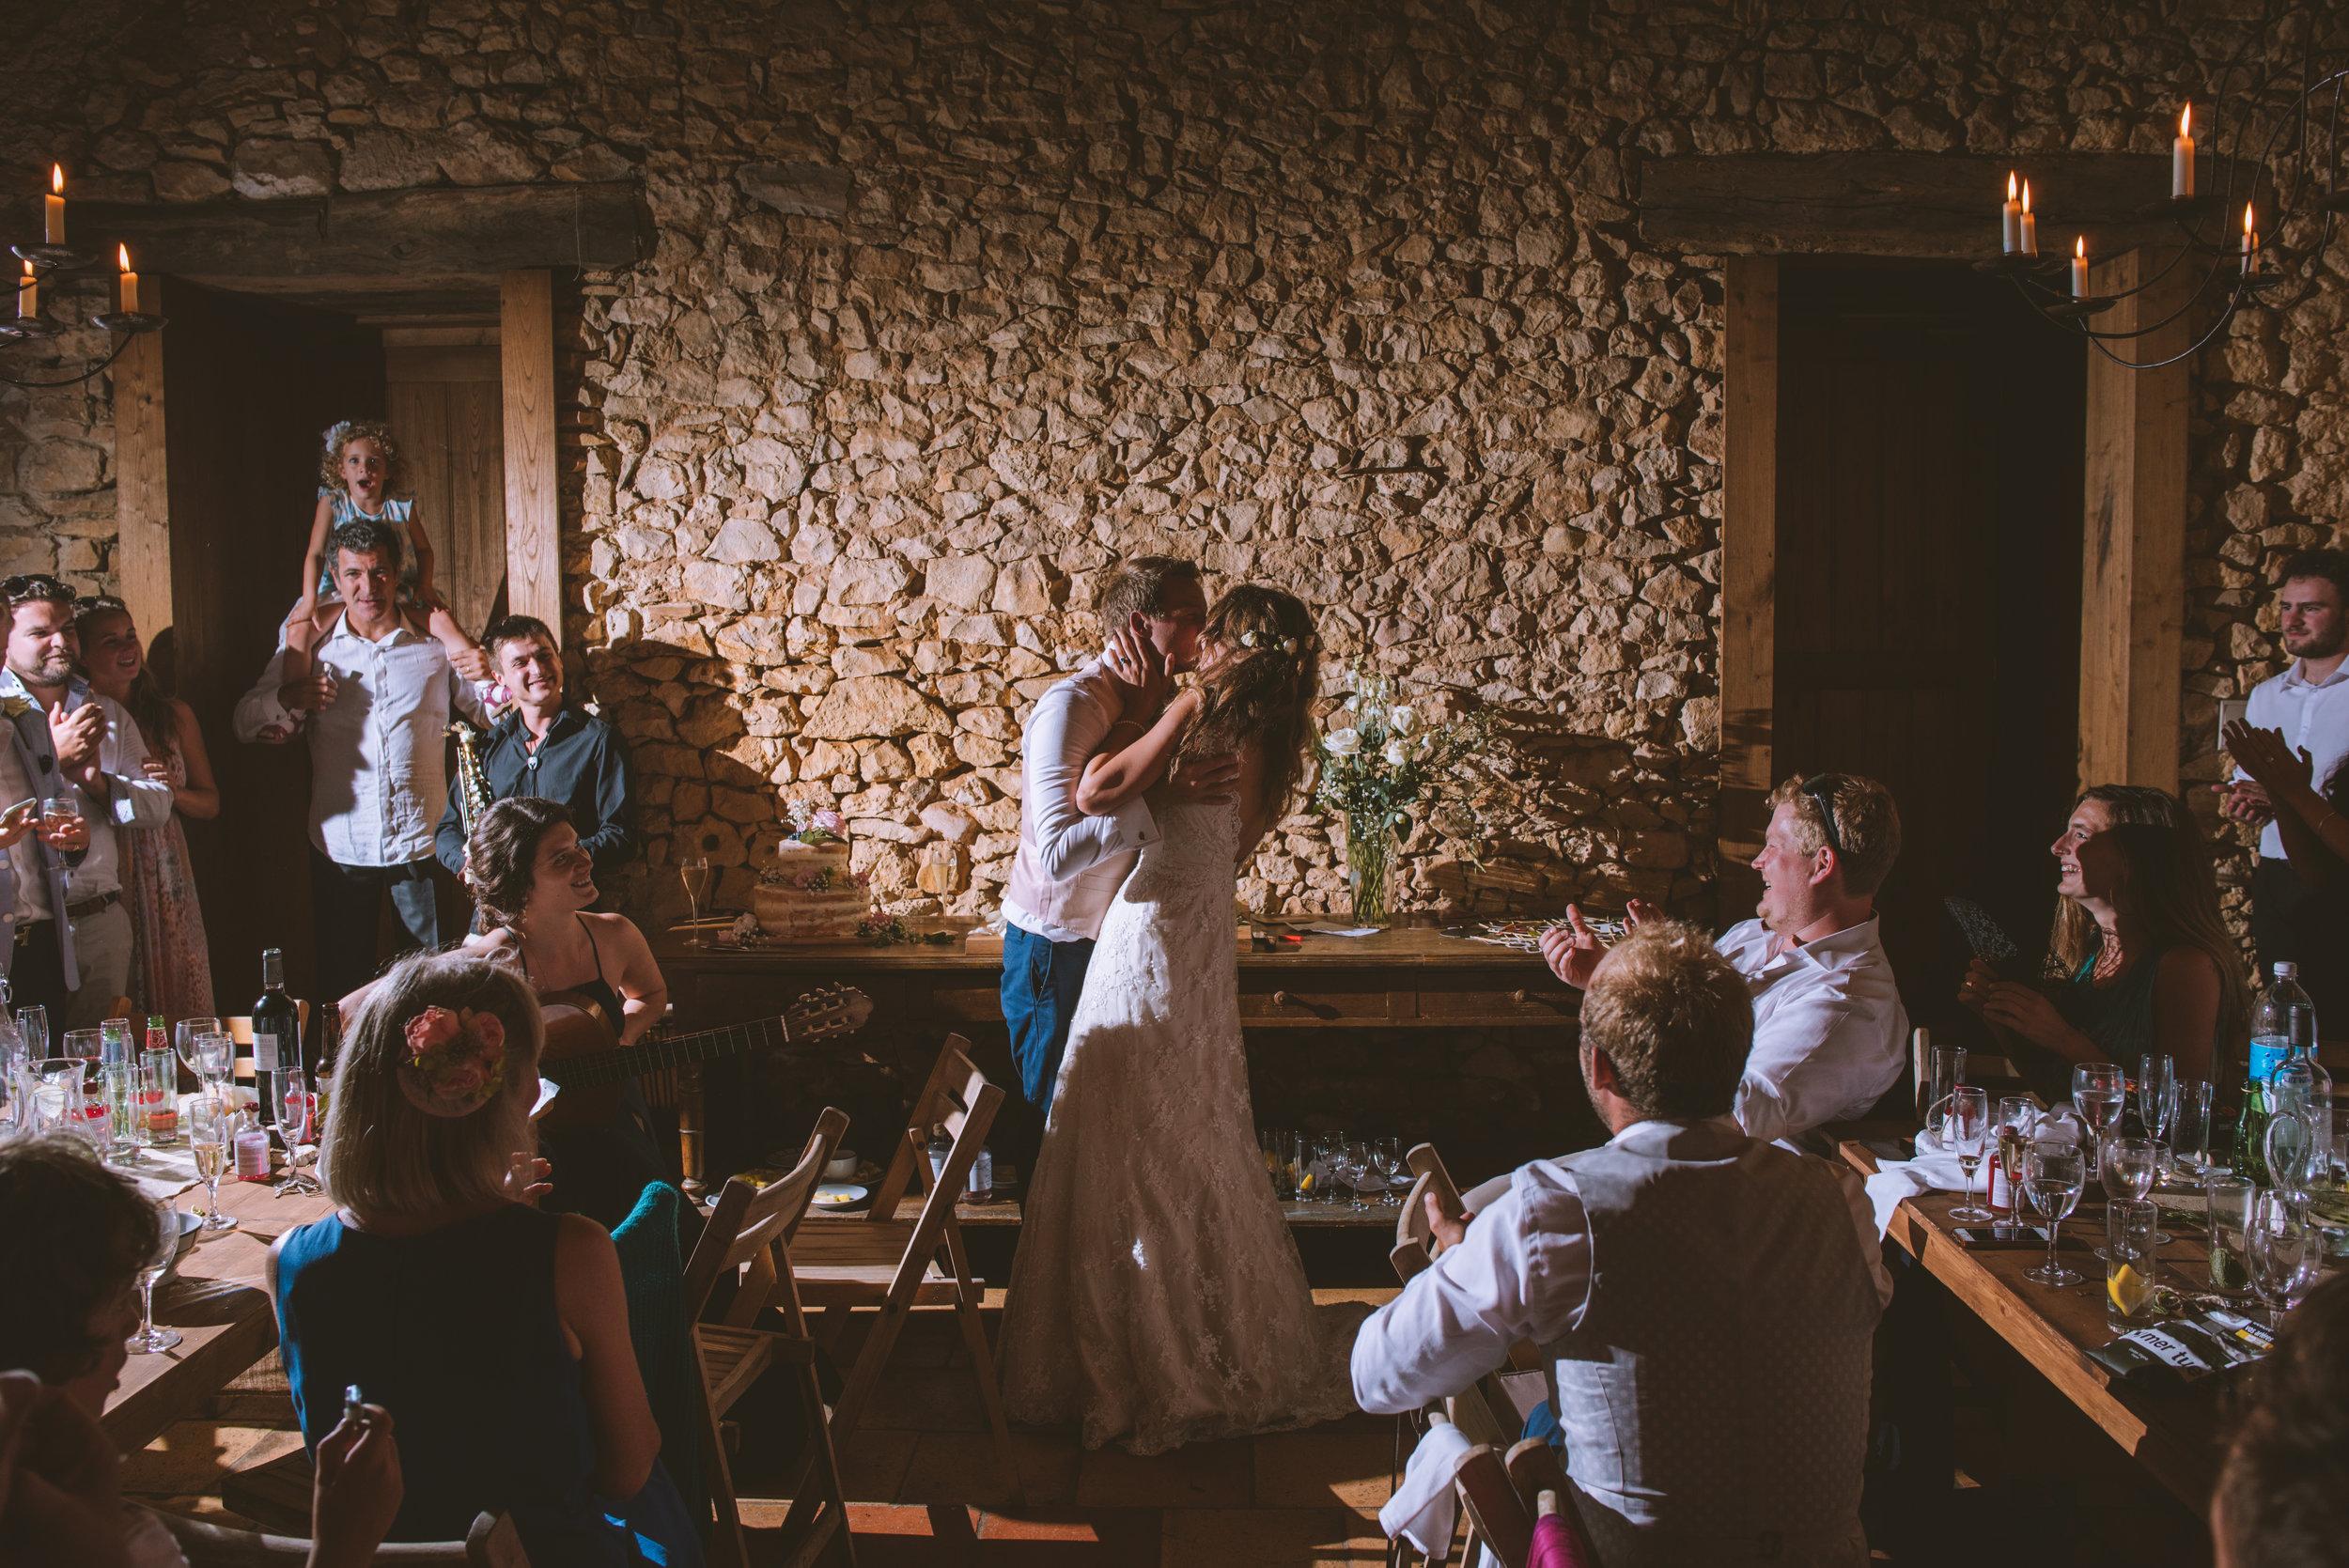 wedding-photographer-dordogne-mark-shaw-67.jpg